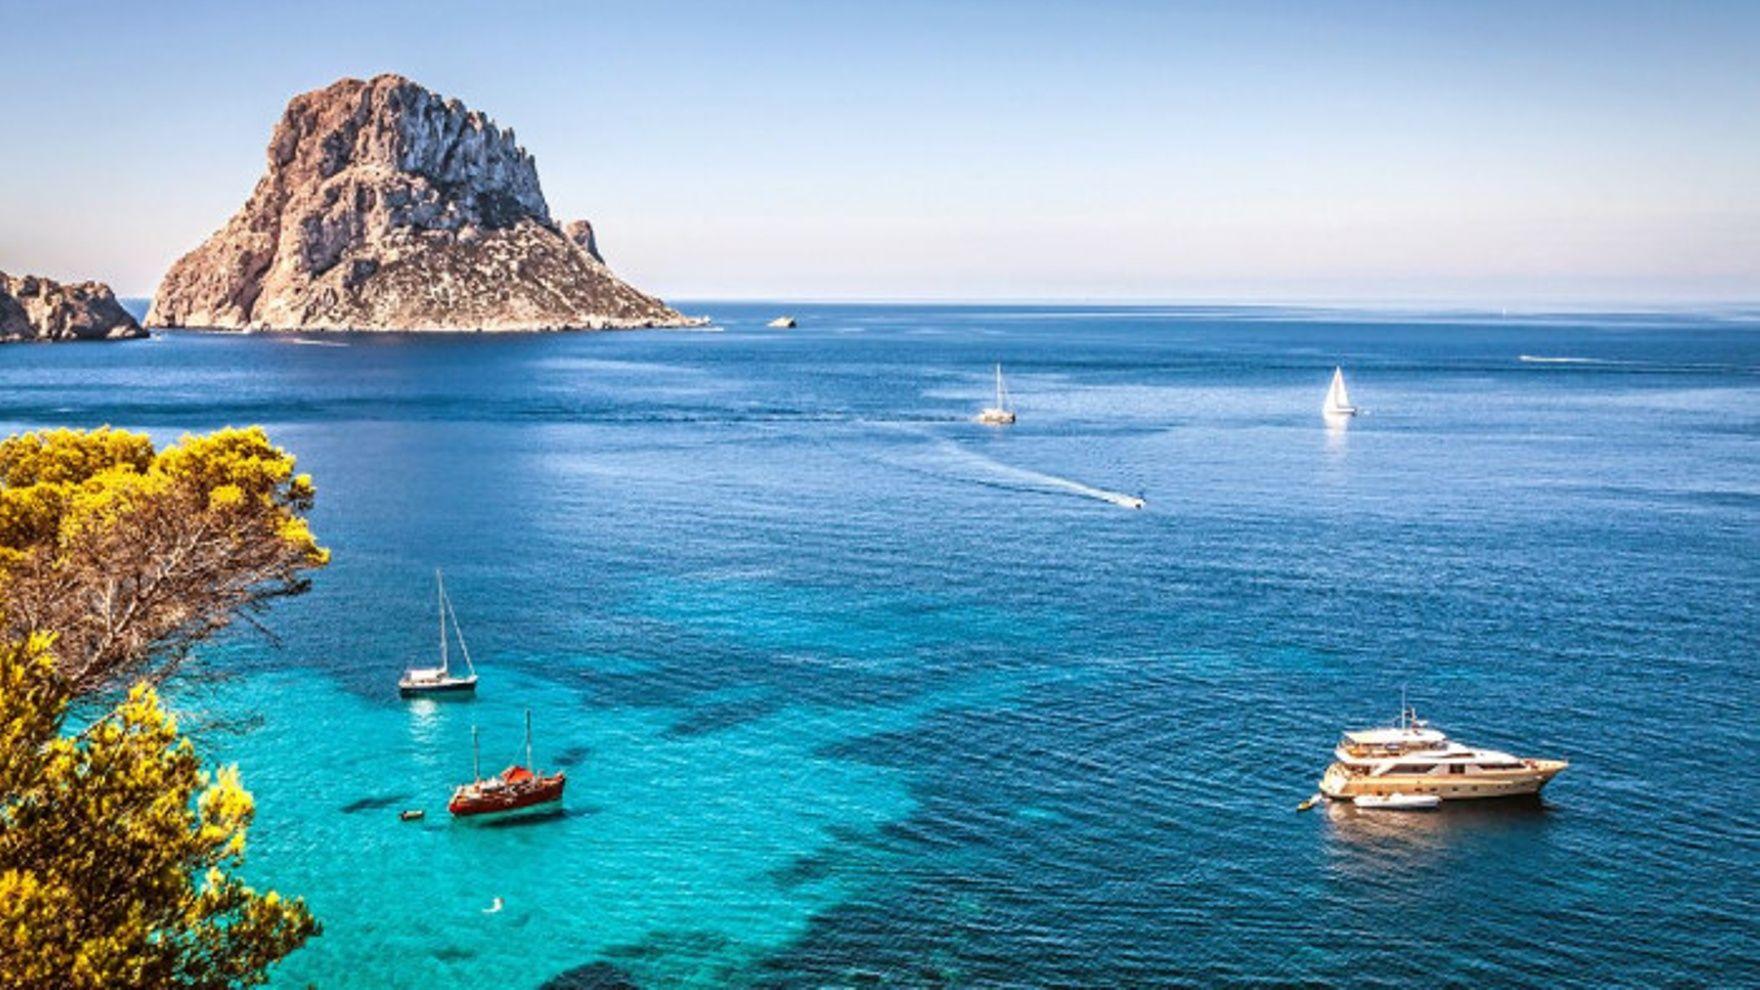 Средиземноморская турецкая парусная практика